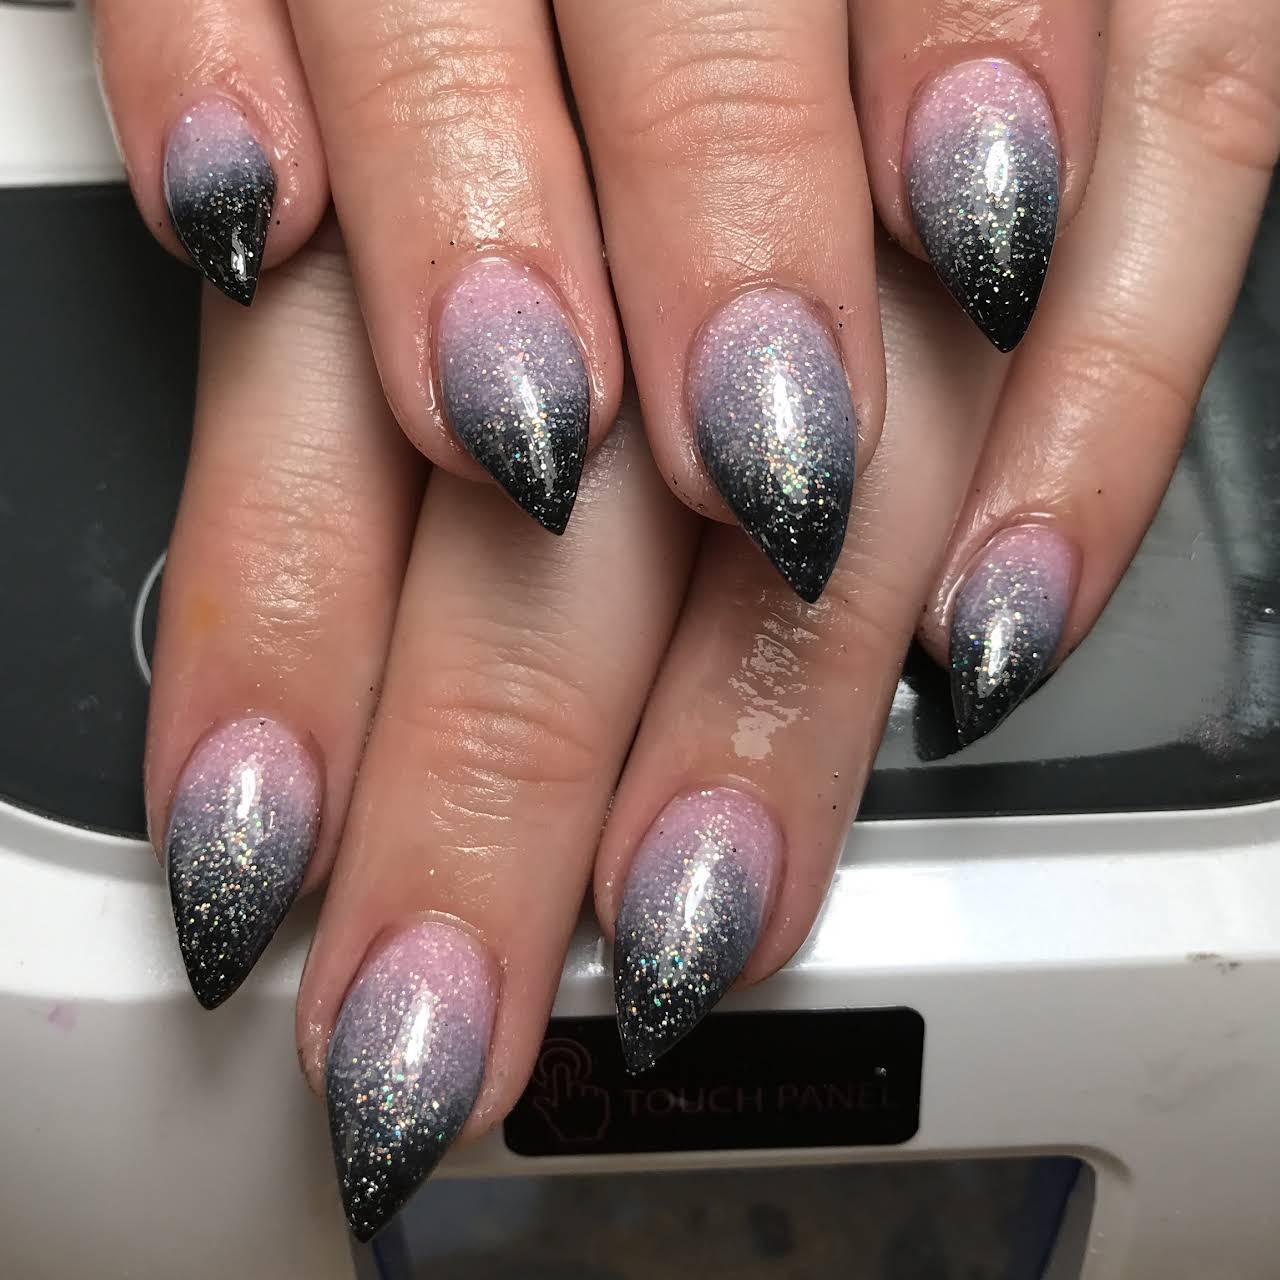 Fashion Nails - Nail Salon in Oakdale